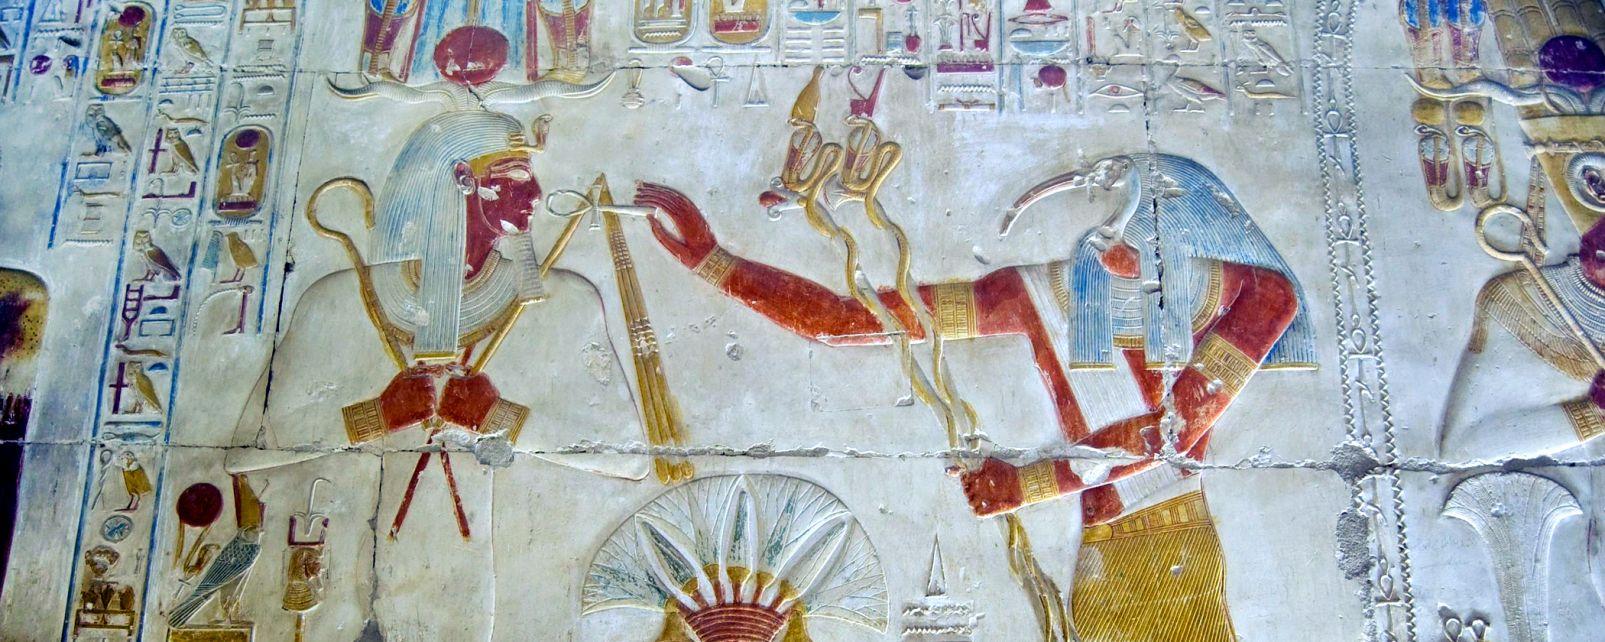 Les sites, thoth, osiris